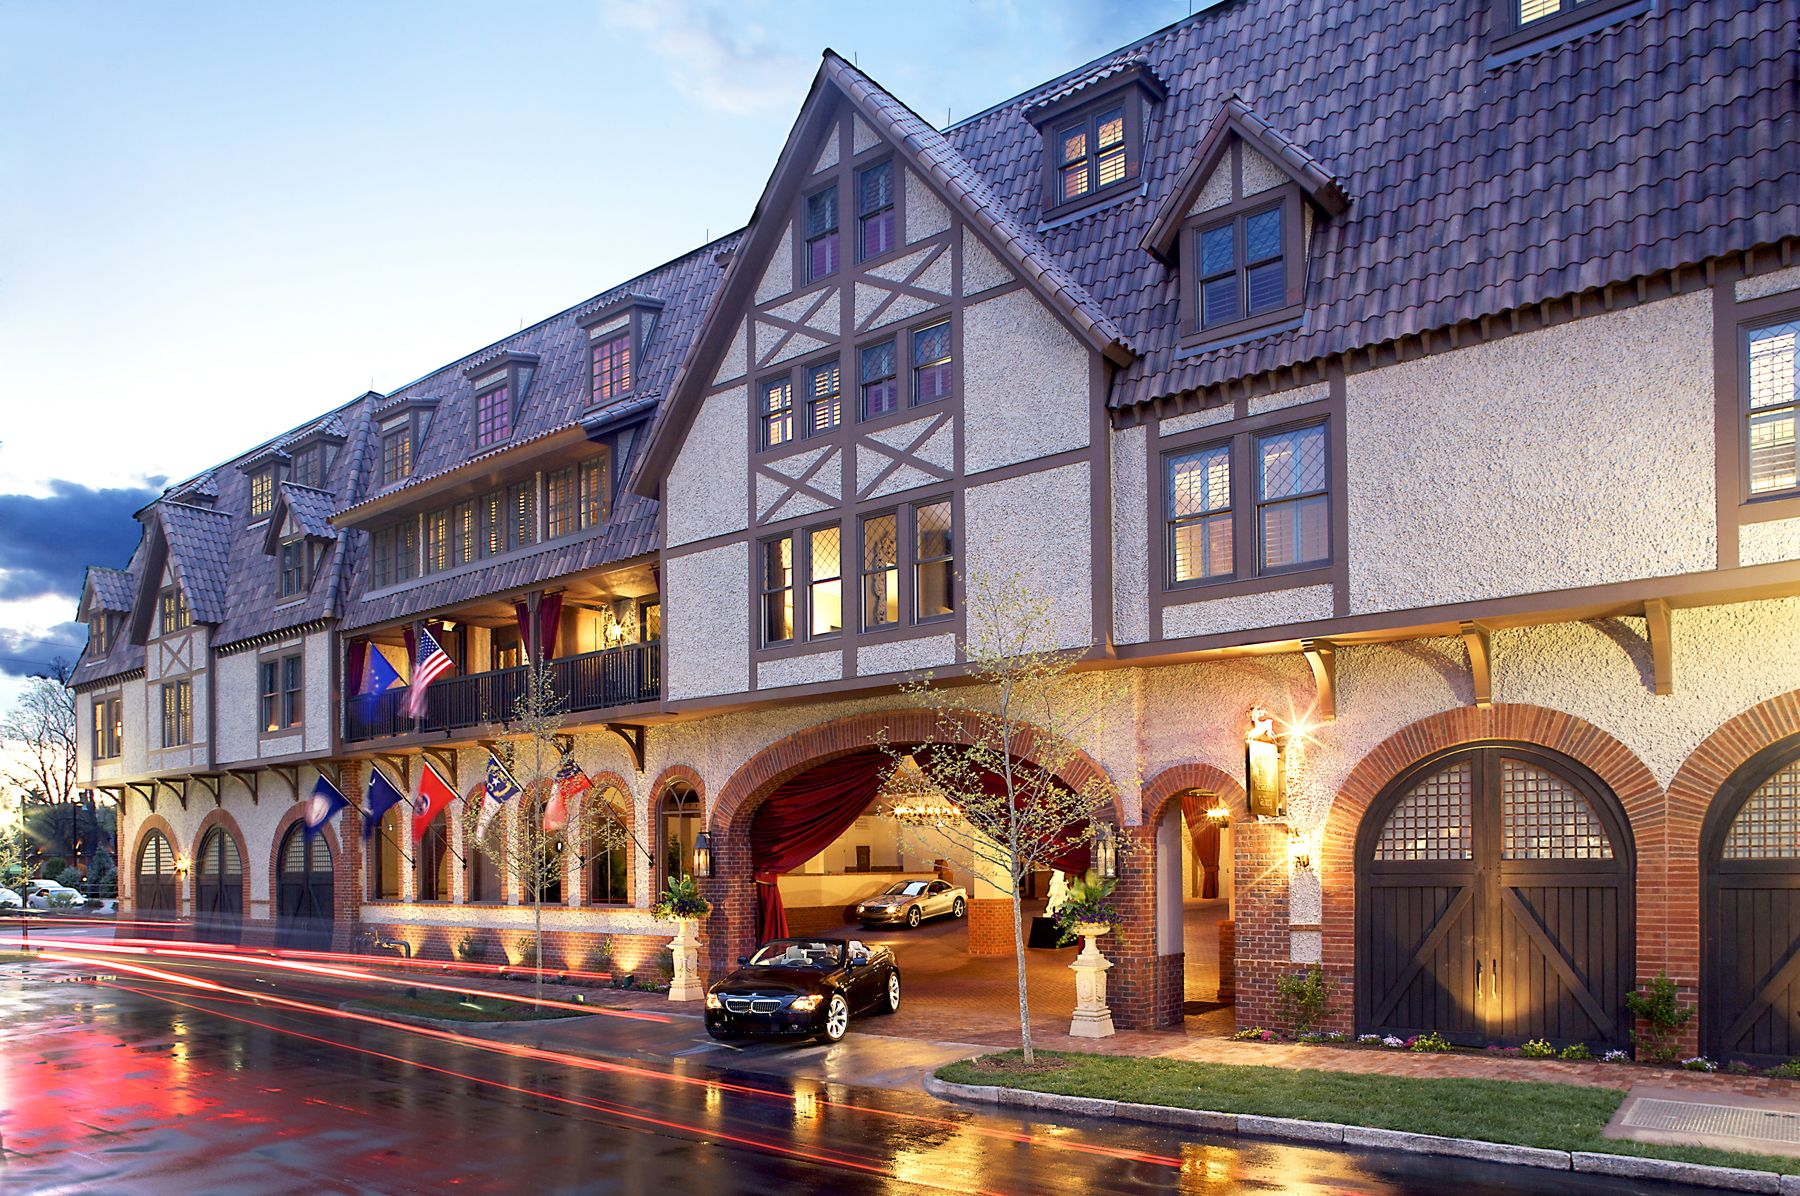 Hotels In Asheville Nc >> Grand Bohemian Hotel Asheville Asheville Nc Hotels North